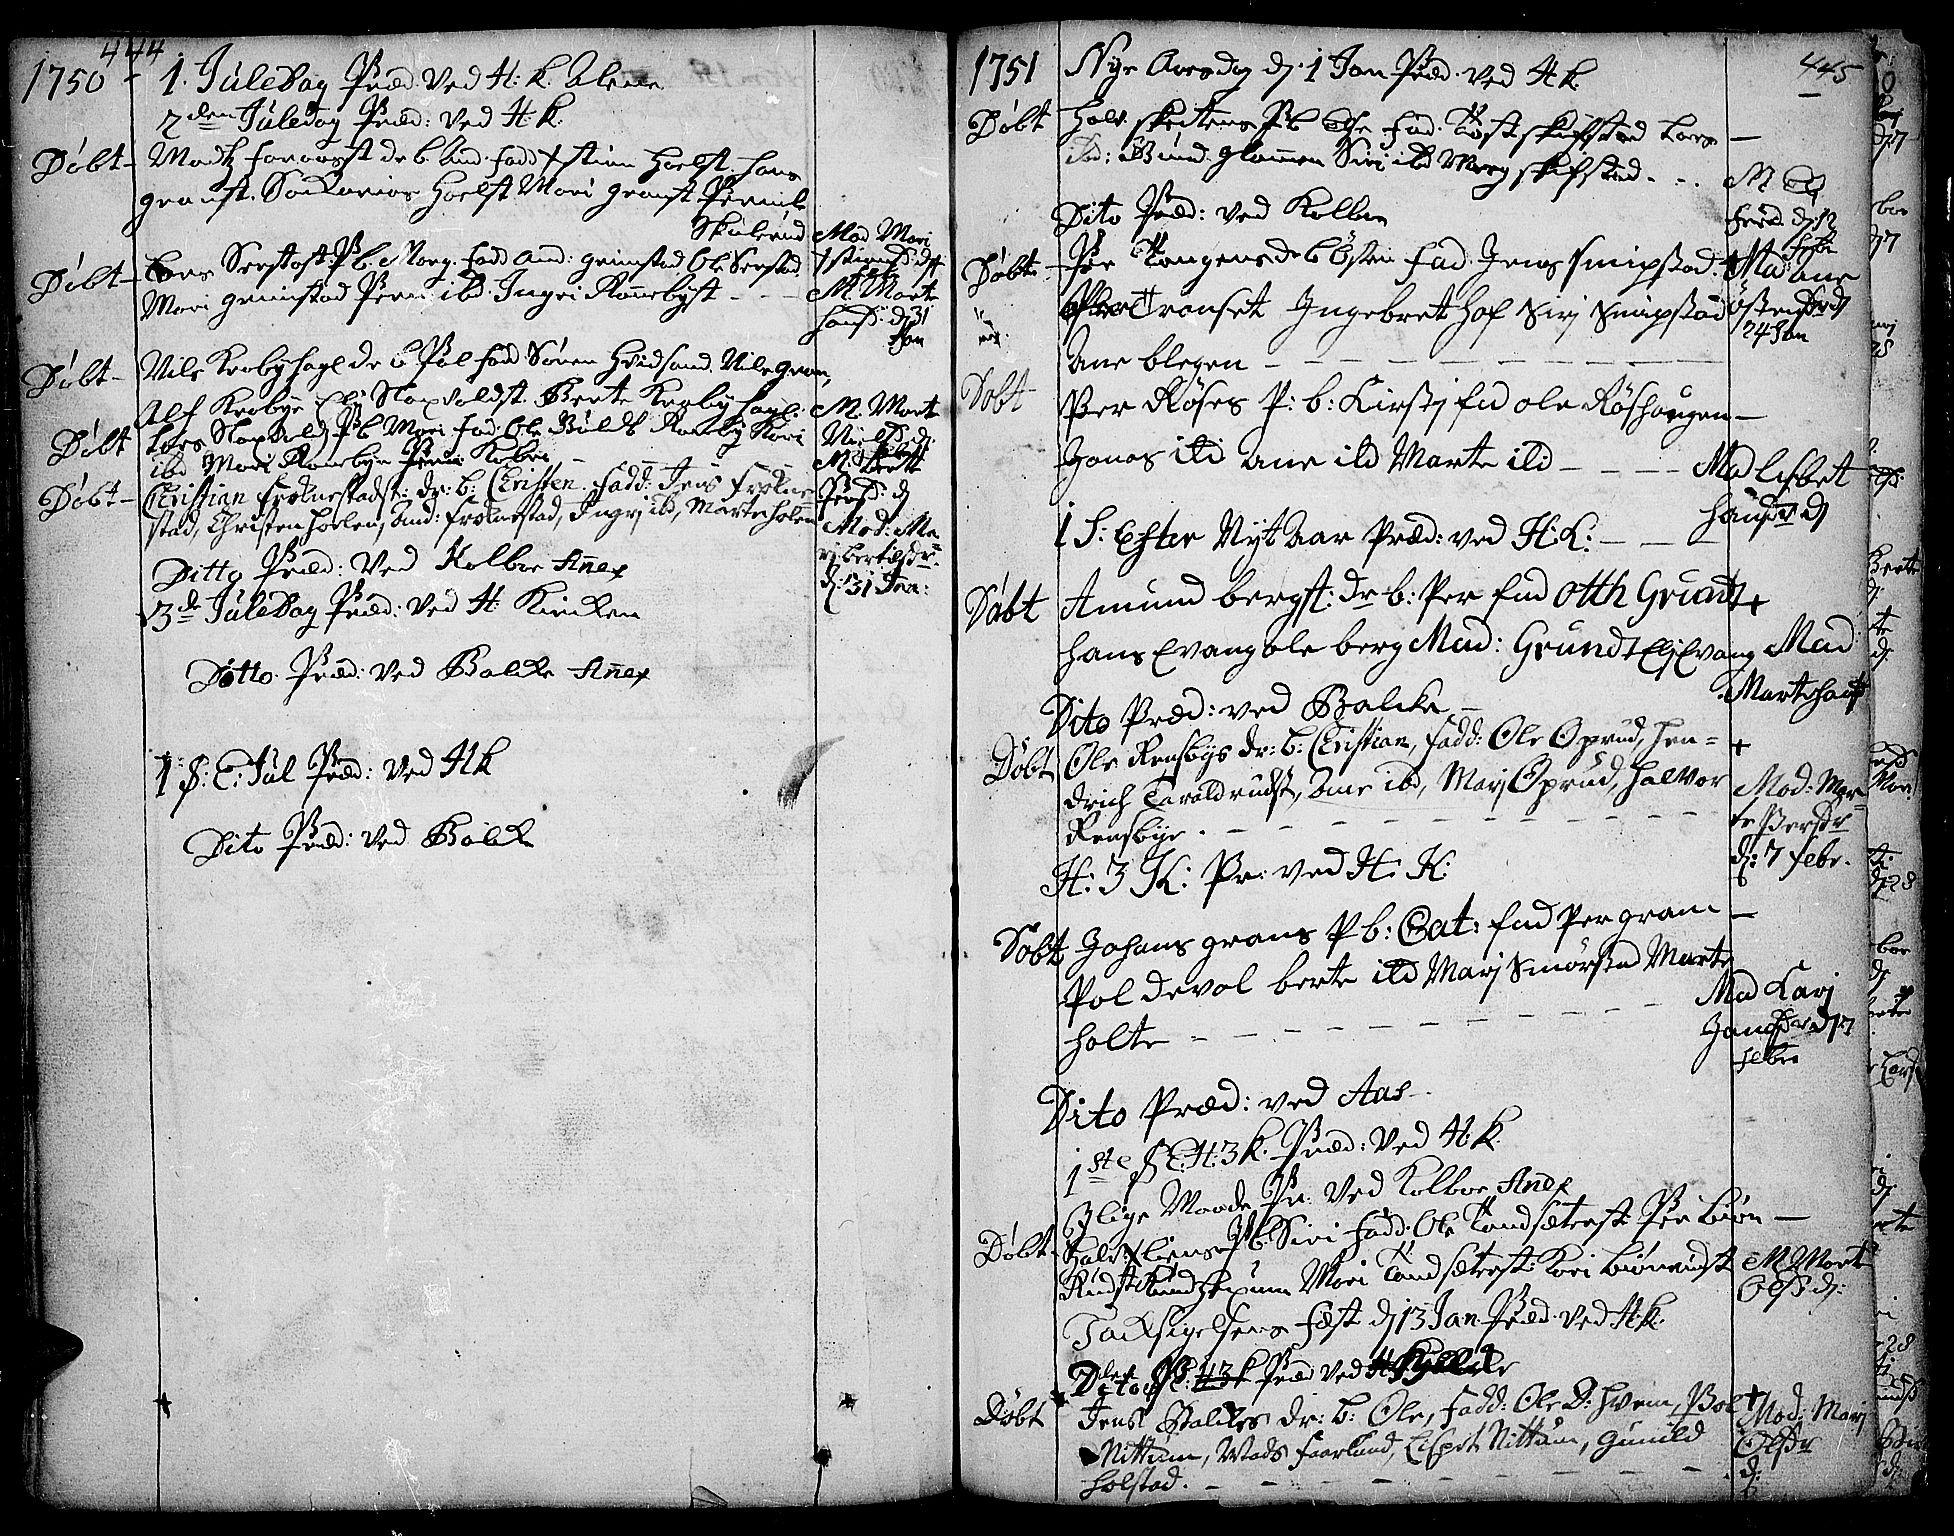 SAH, Toten prestekontor, Ministerialbok nr. 3, 1734-1751, s. 444-445